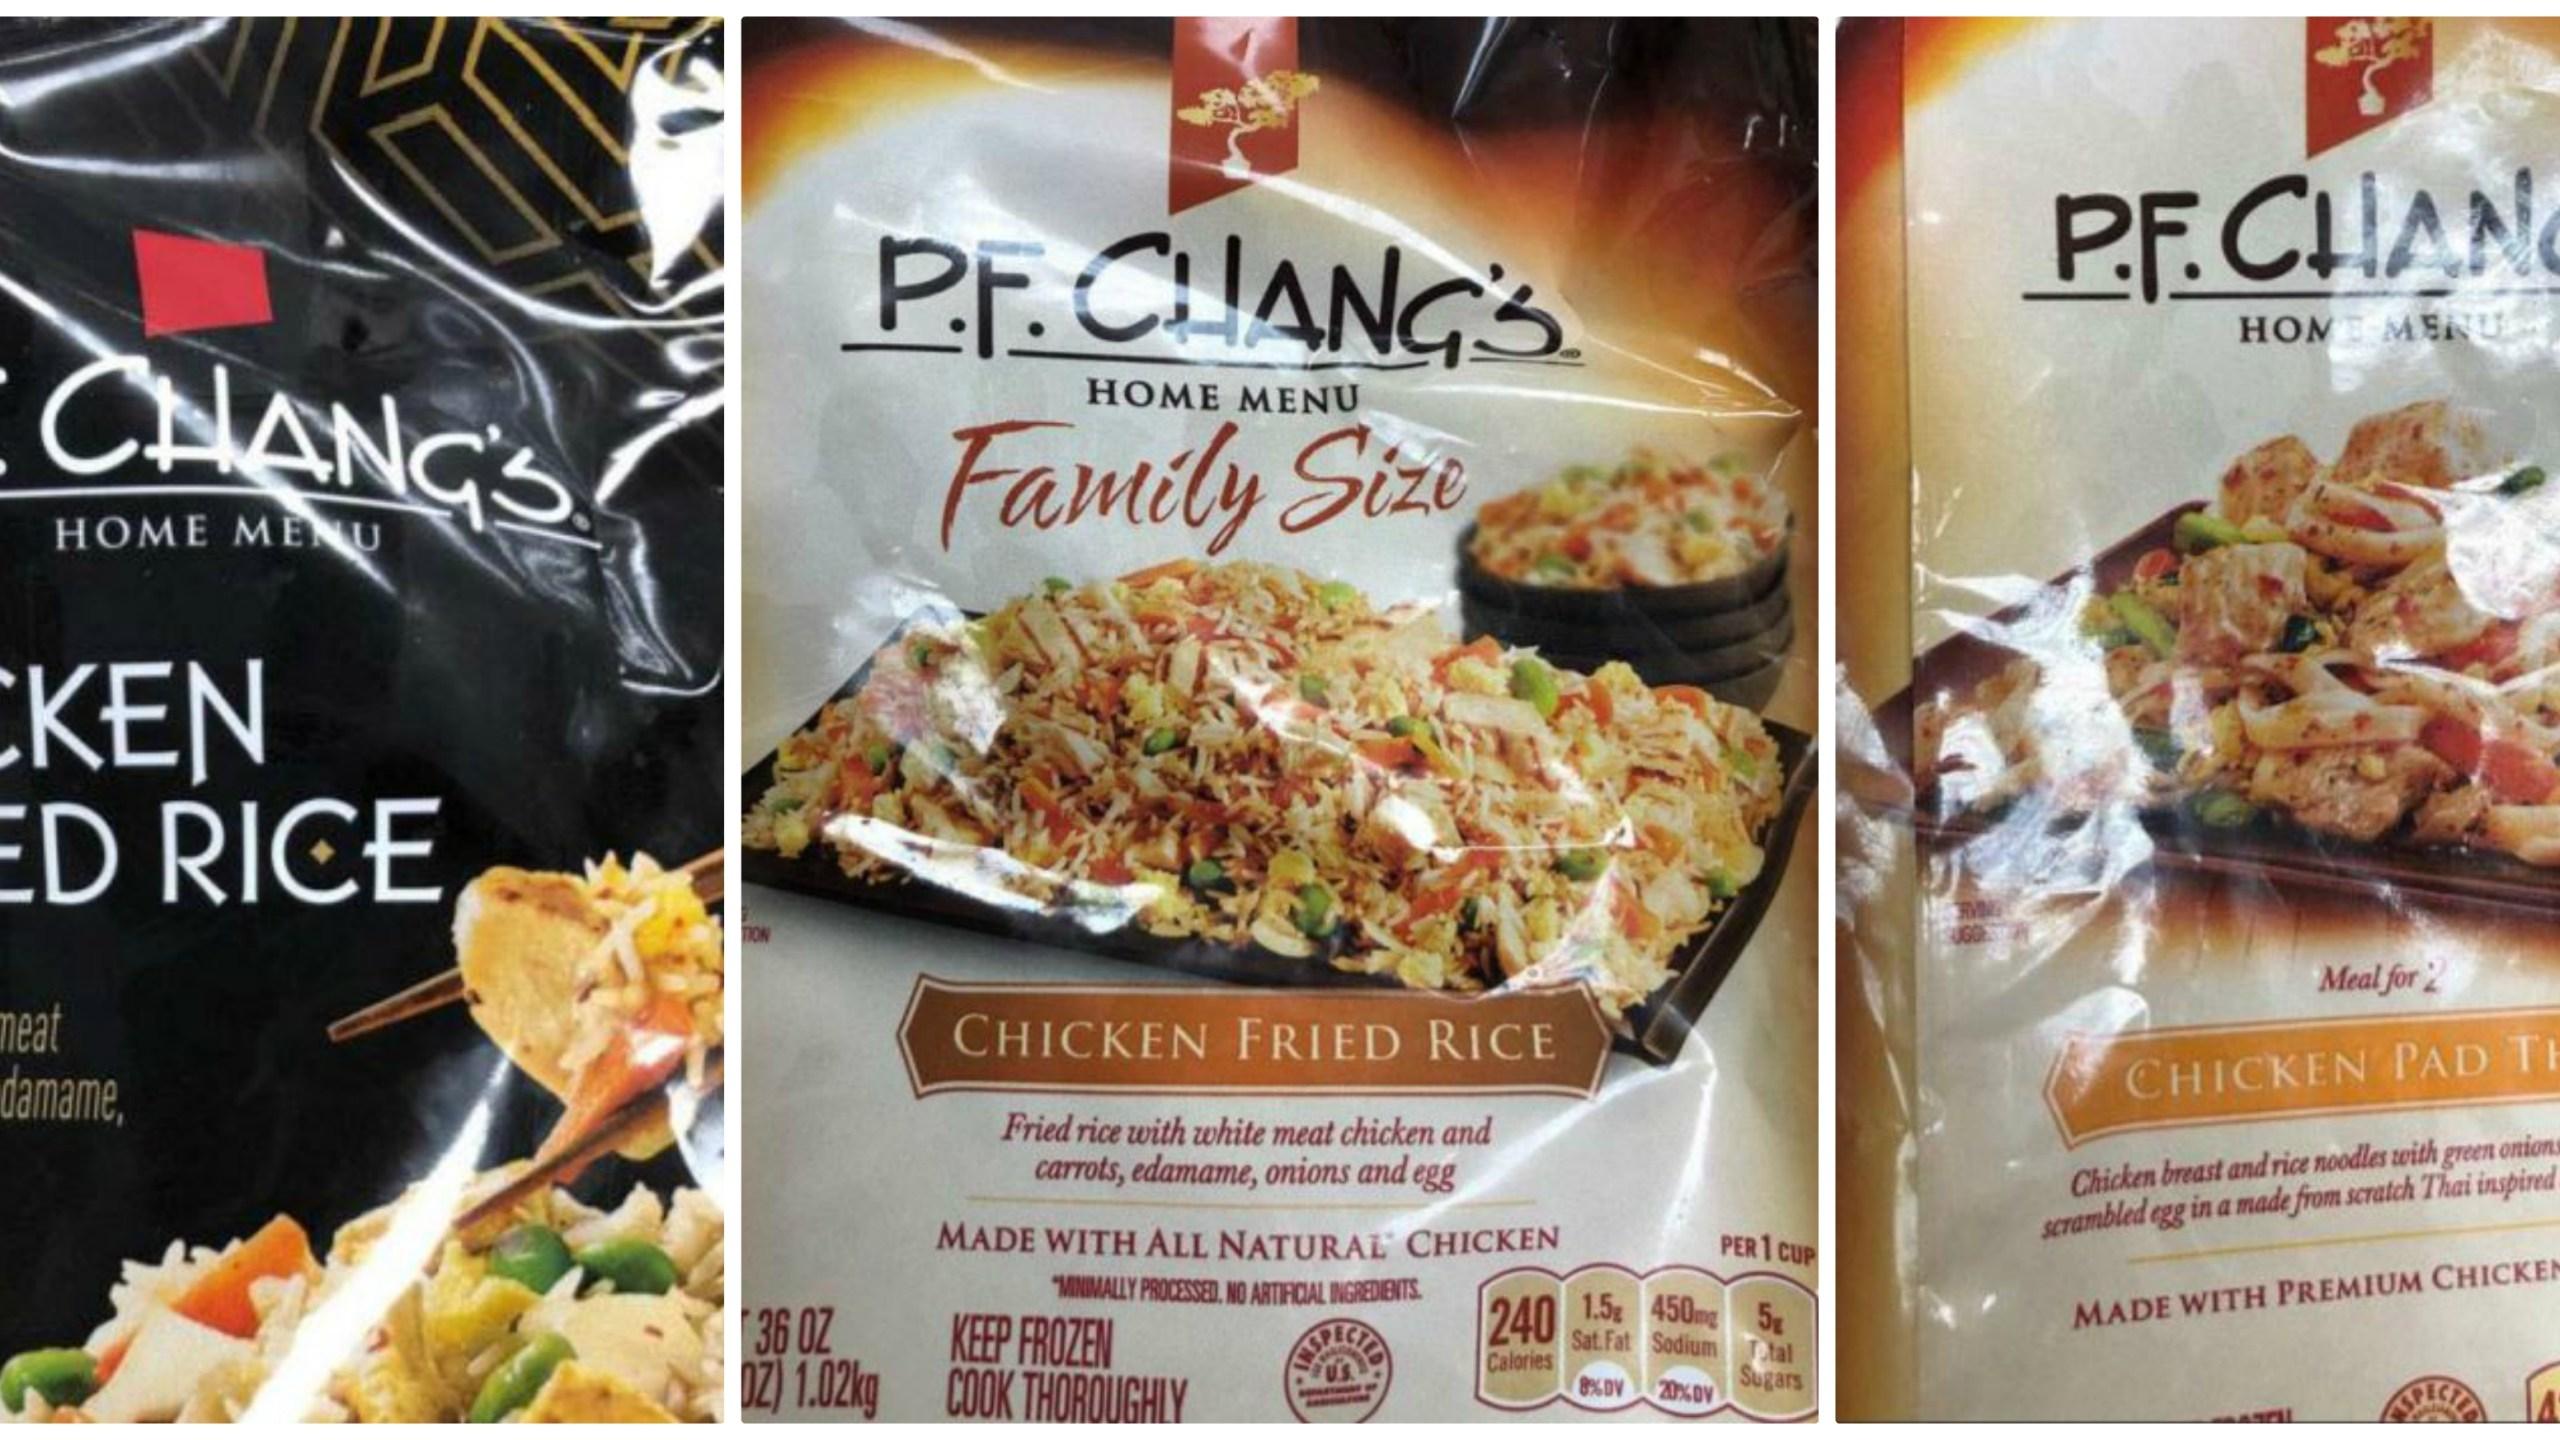 PF Chang's Recalled Frozen Meals